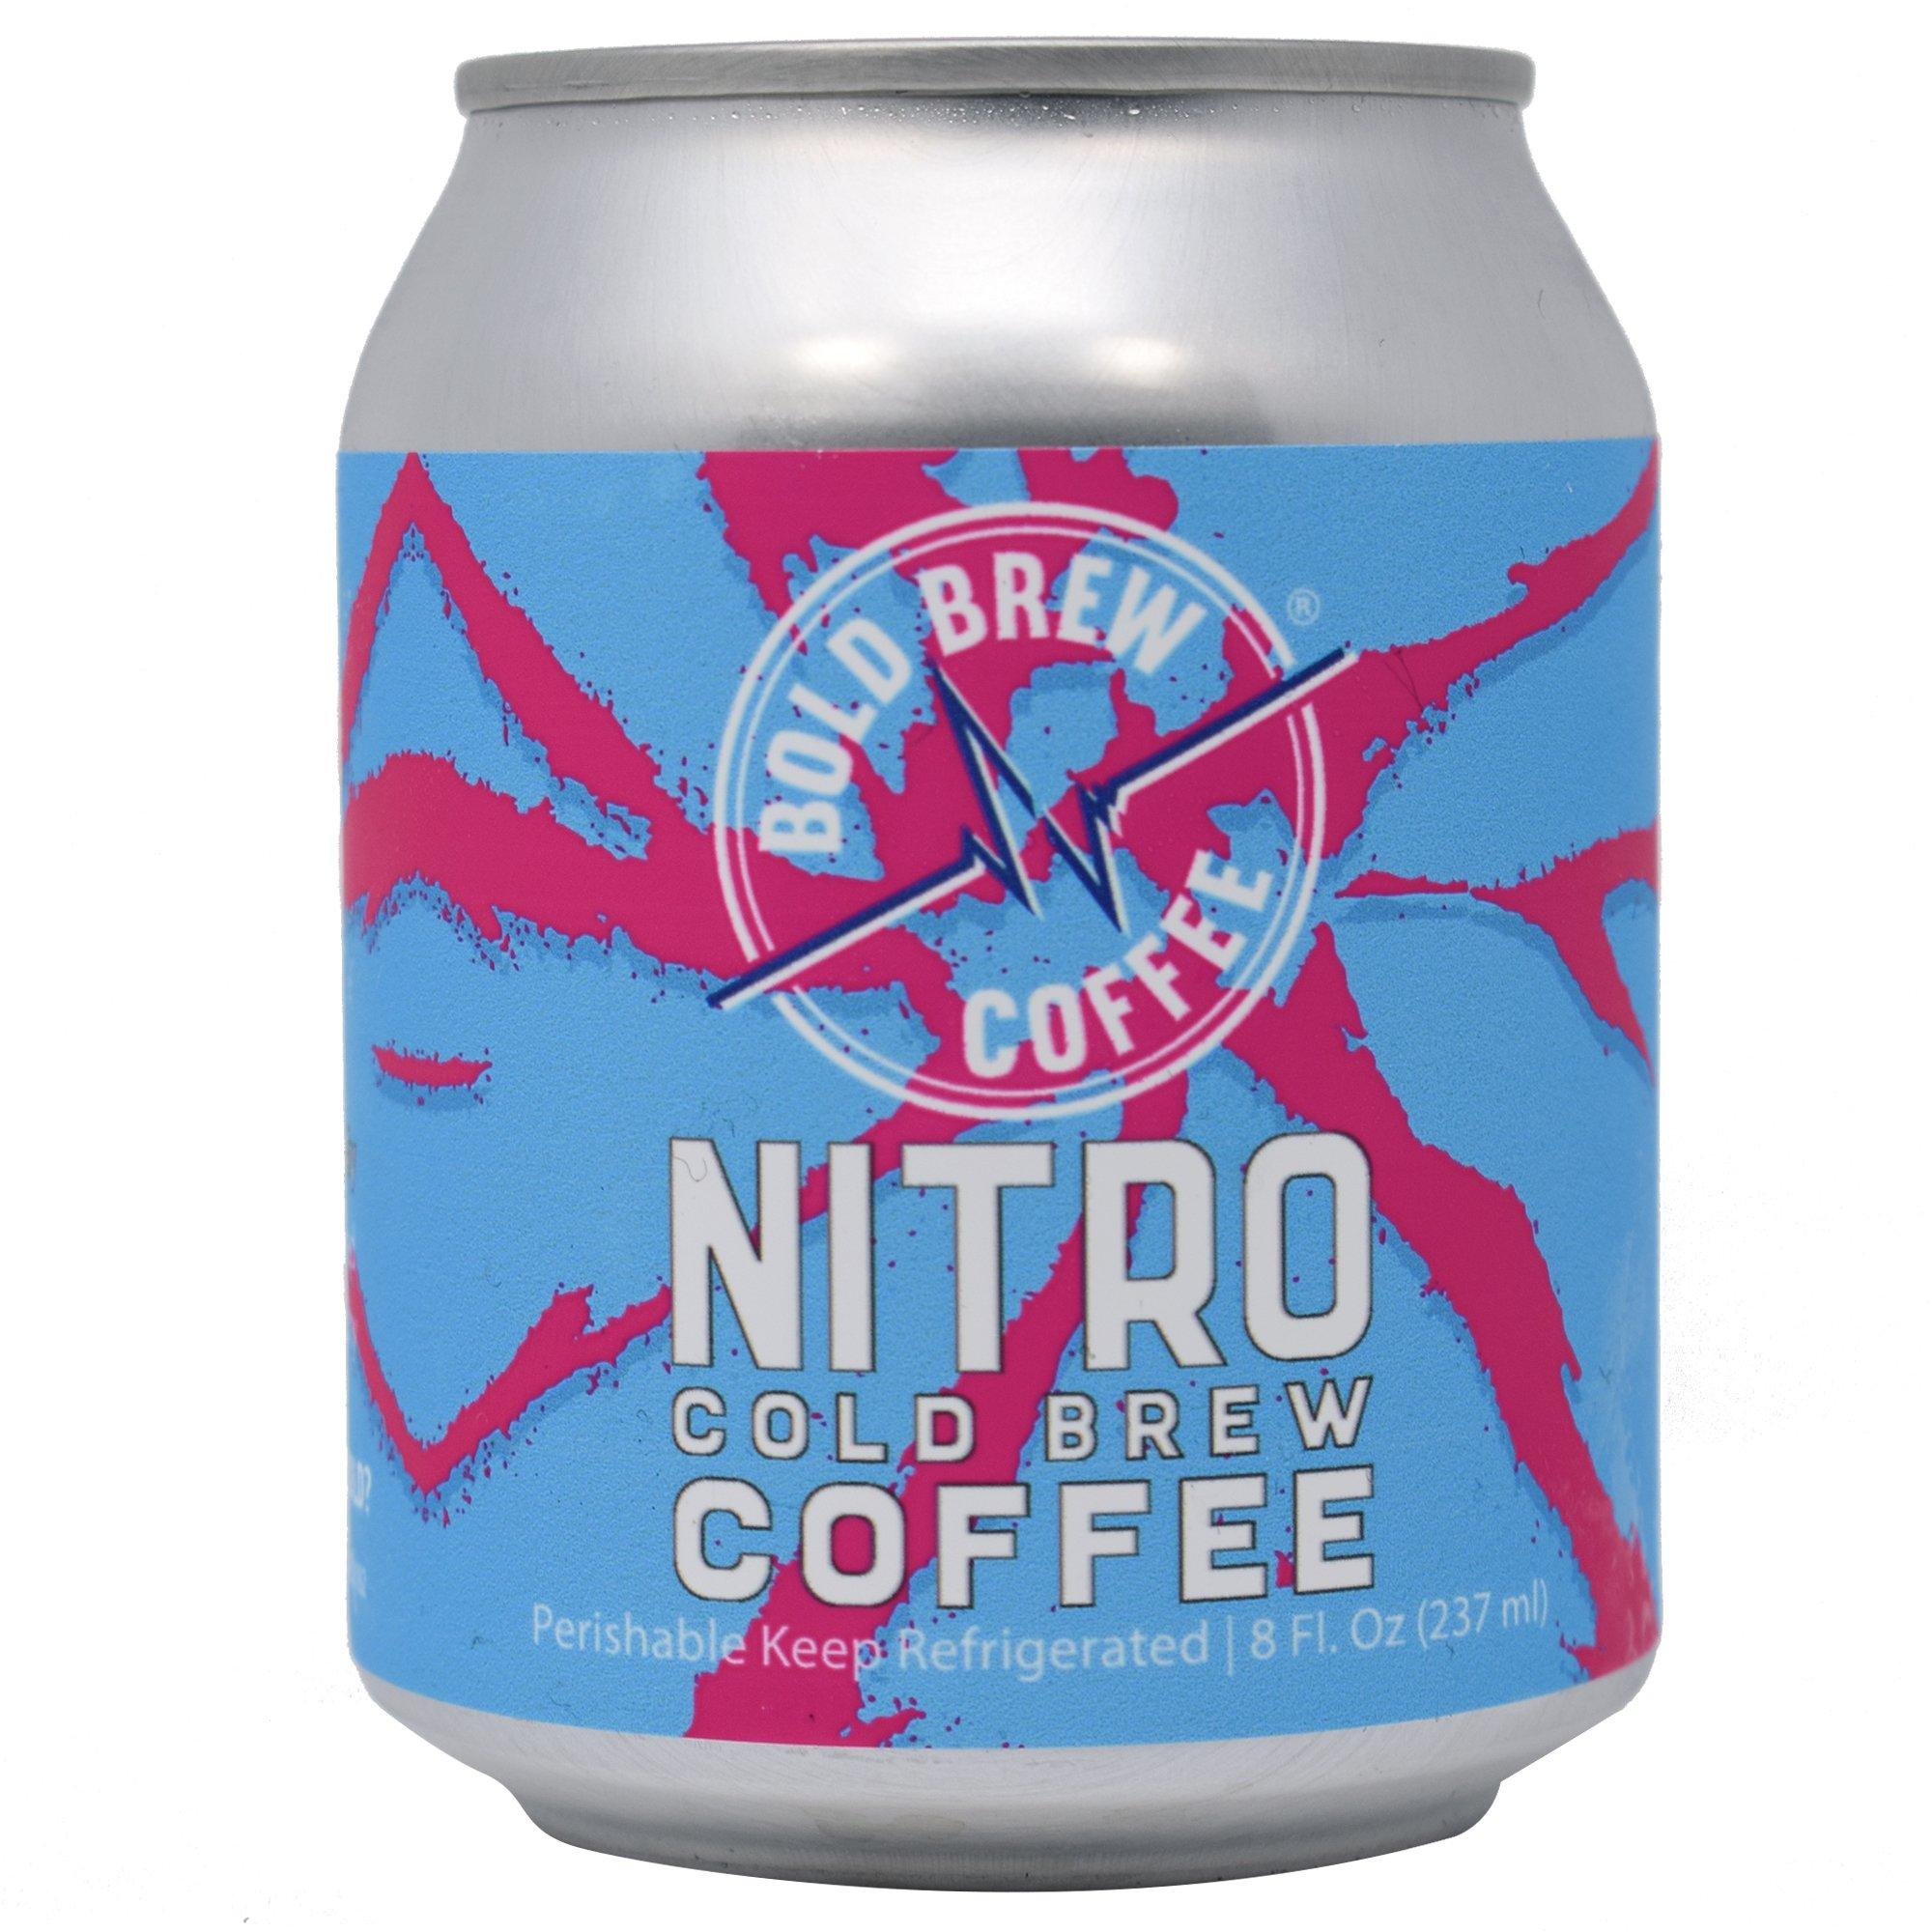 Nitro Cold Brew Coffee - Bold Brew Coffee, Single-Origin Colombian Coffee   Natural Energy   Sugar, Gluten & Dairy Free, 0 Calories, 180 MG Caffeine   8oz Can - (6 Pack)